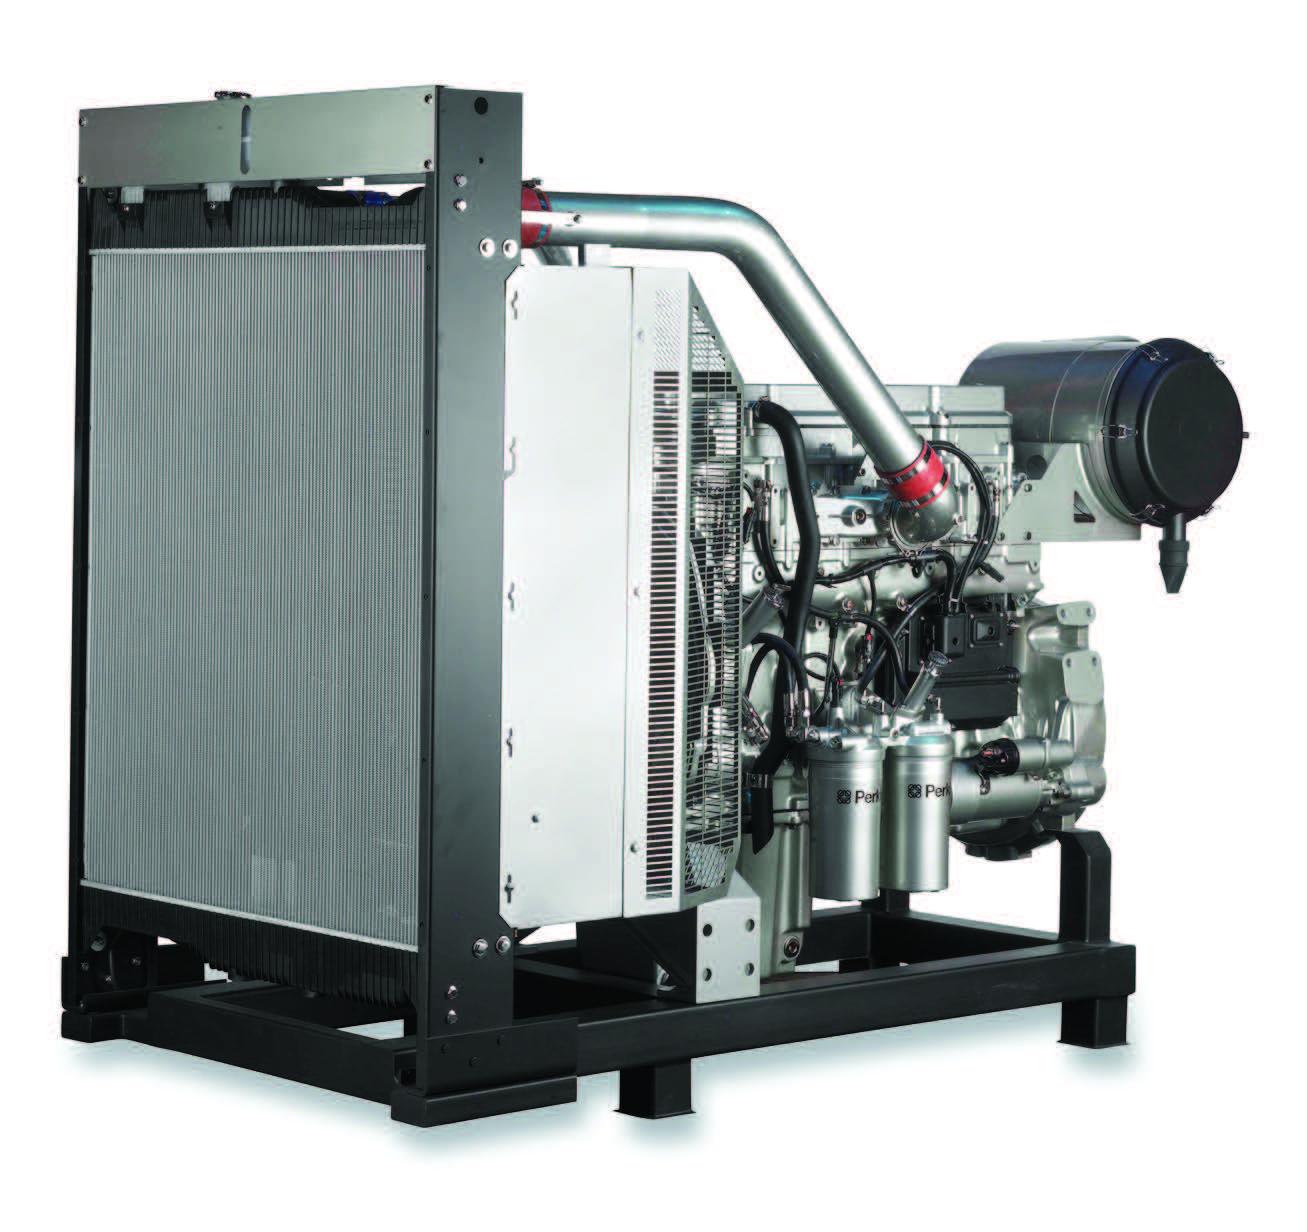 CKD: 2206A-E13TAG3 Diesel Engine – ElectropaK + PRO28LG/4